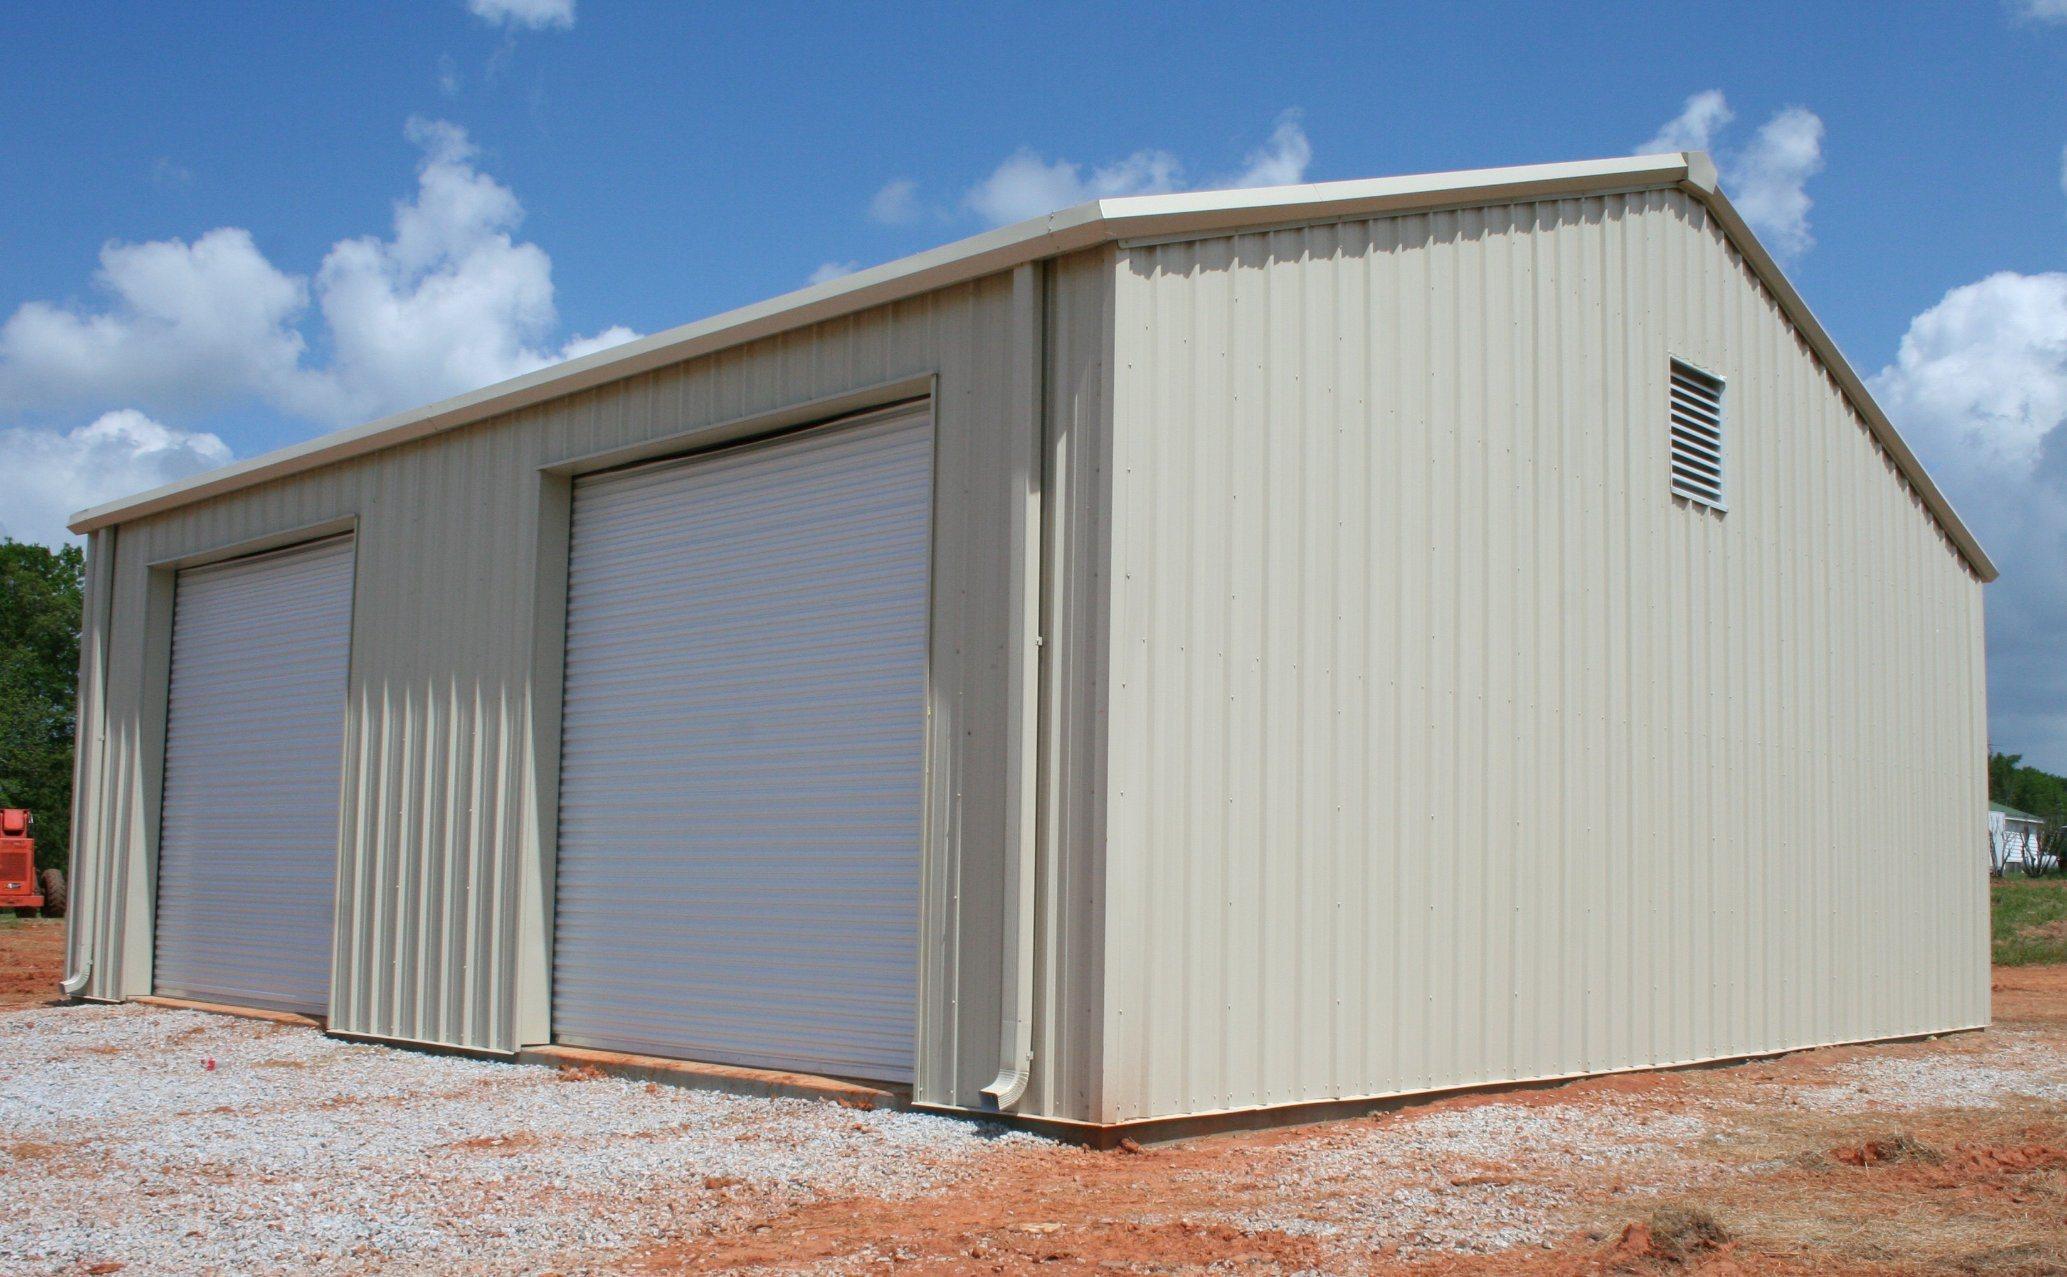 China Popular Products Australian Prefab Steel Structure Metal Garage Storeroom Modular Shed China Steel Structure Warehouse Steel Structure House Carports